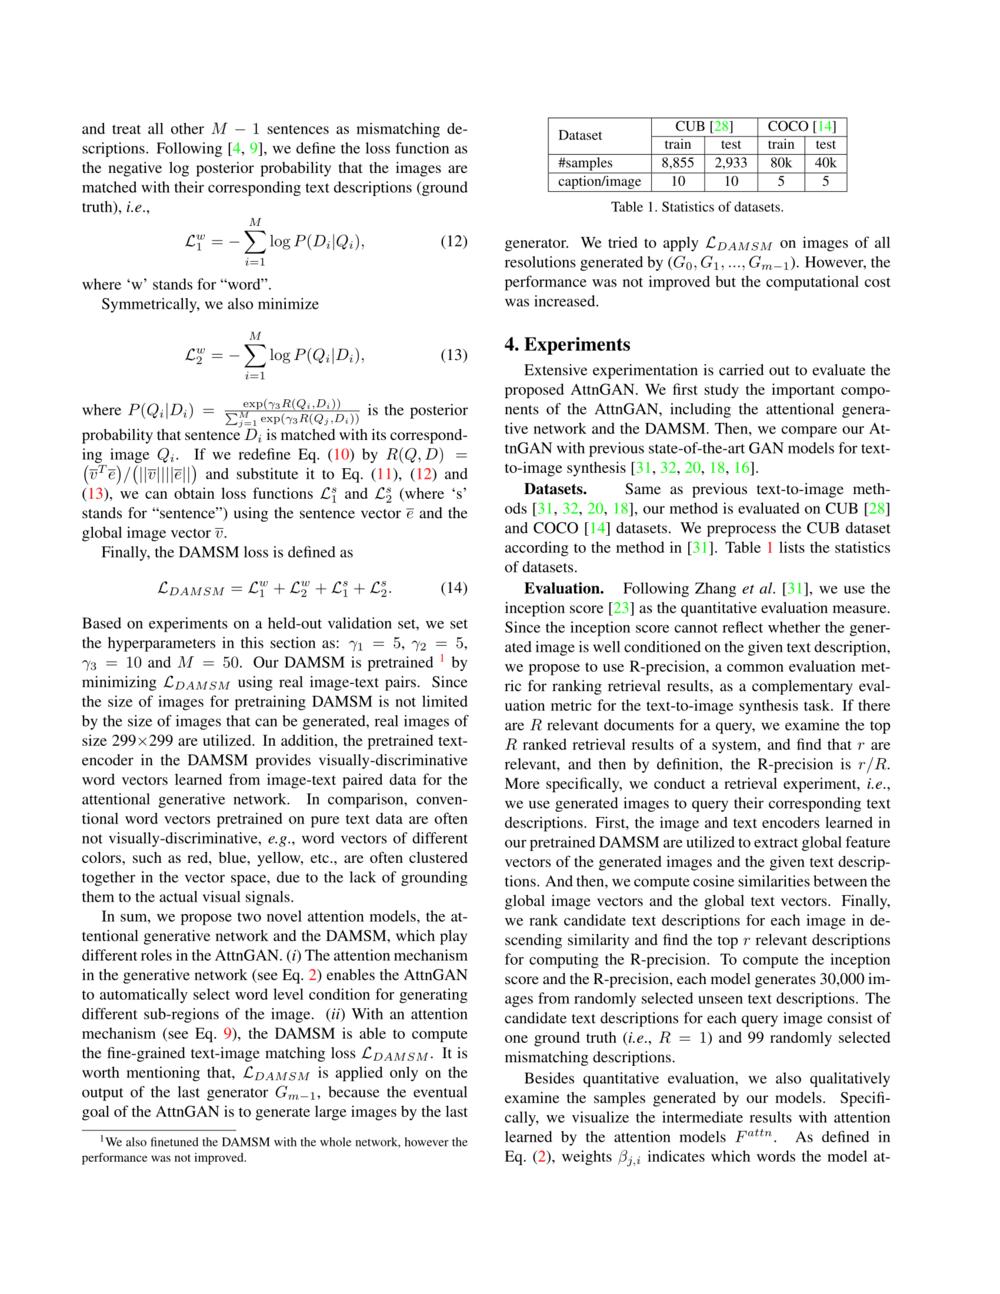 microsoft-researchers-build-a-bot-that-draws.001-5.png